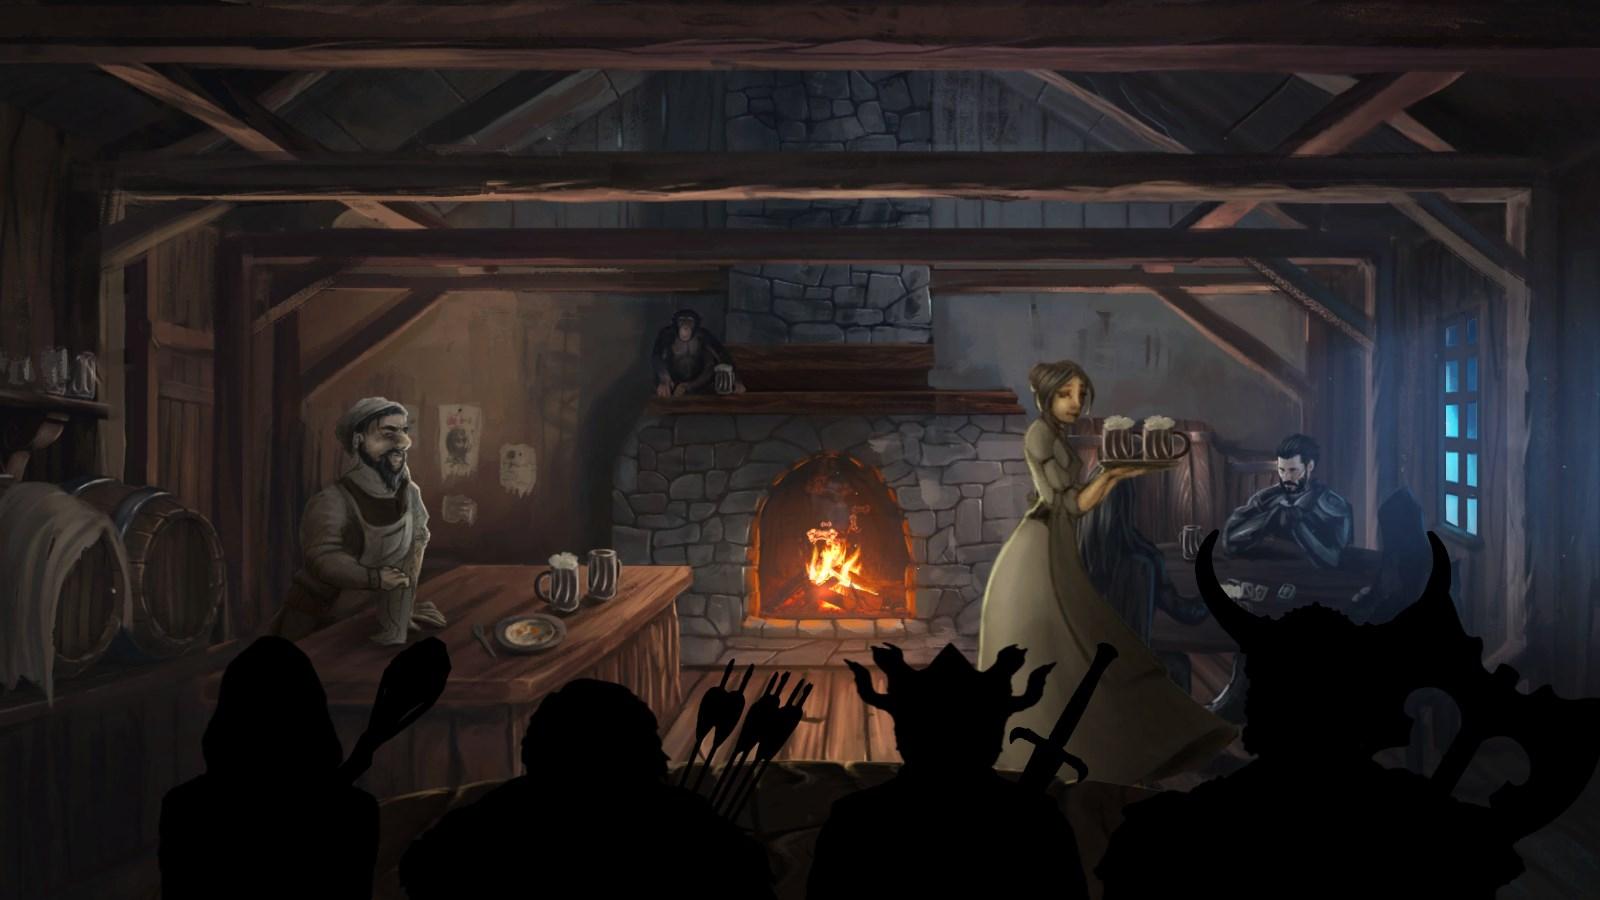 RPG old school : Dungeon Master, Eye Of Beholder, Grimrock.. - Page 6 MonkeyTavern